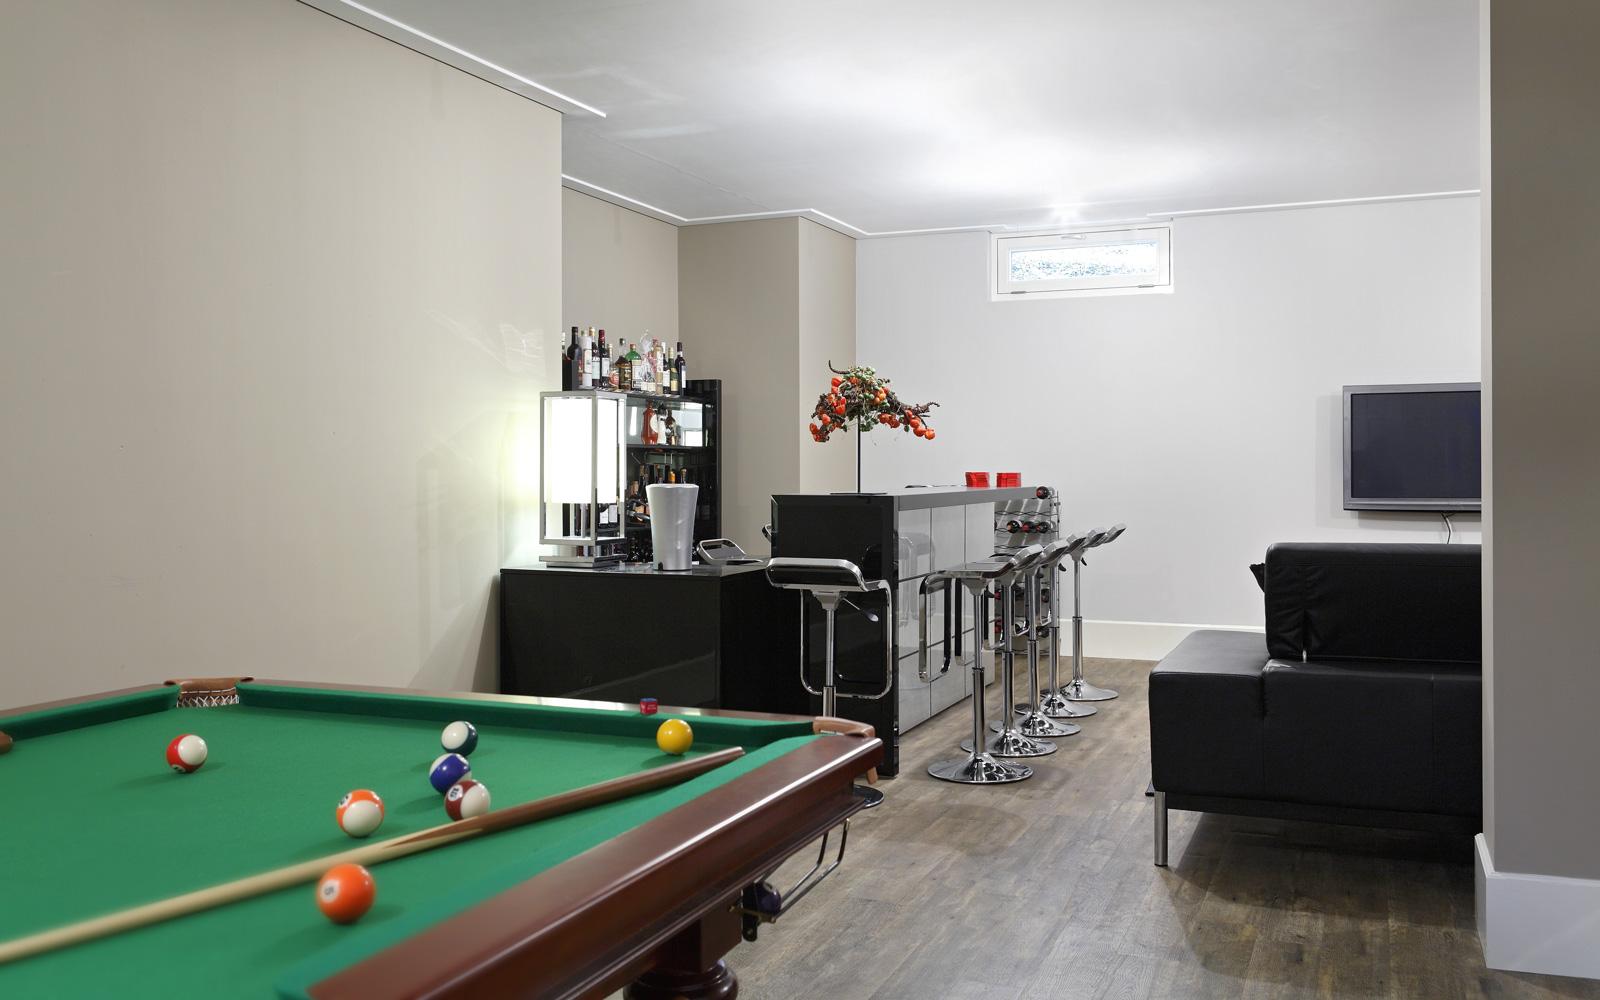 Kelder, biljart, speelruimte, bar, Franse villa, Hertroijs Architekten